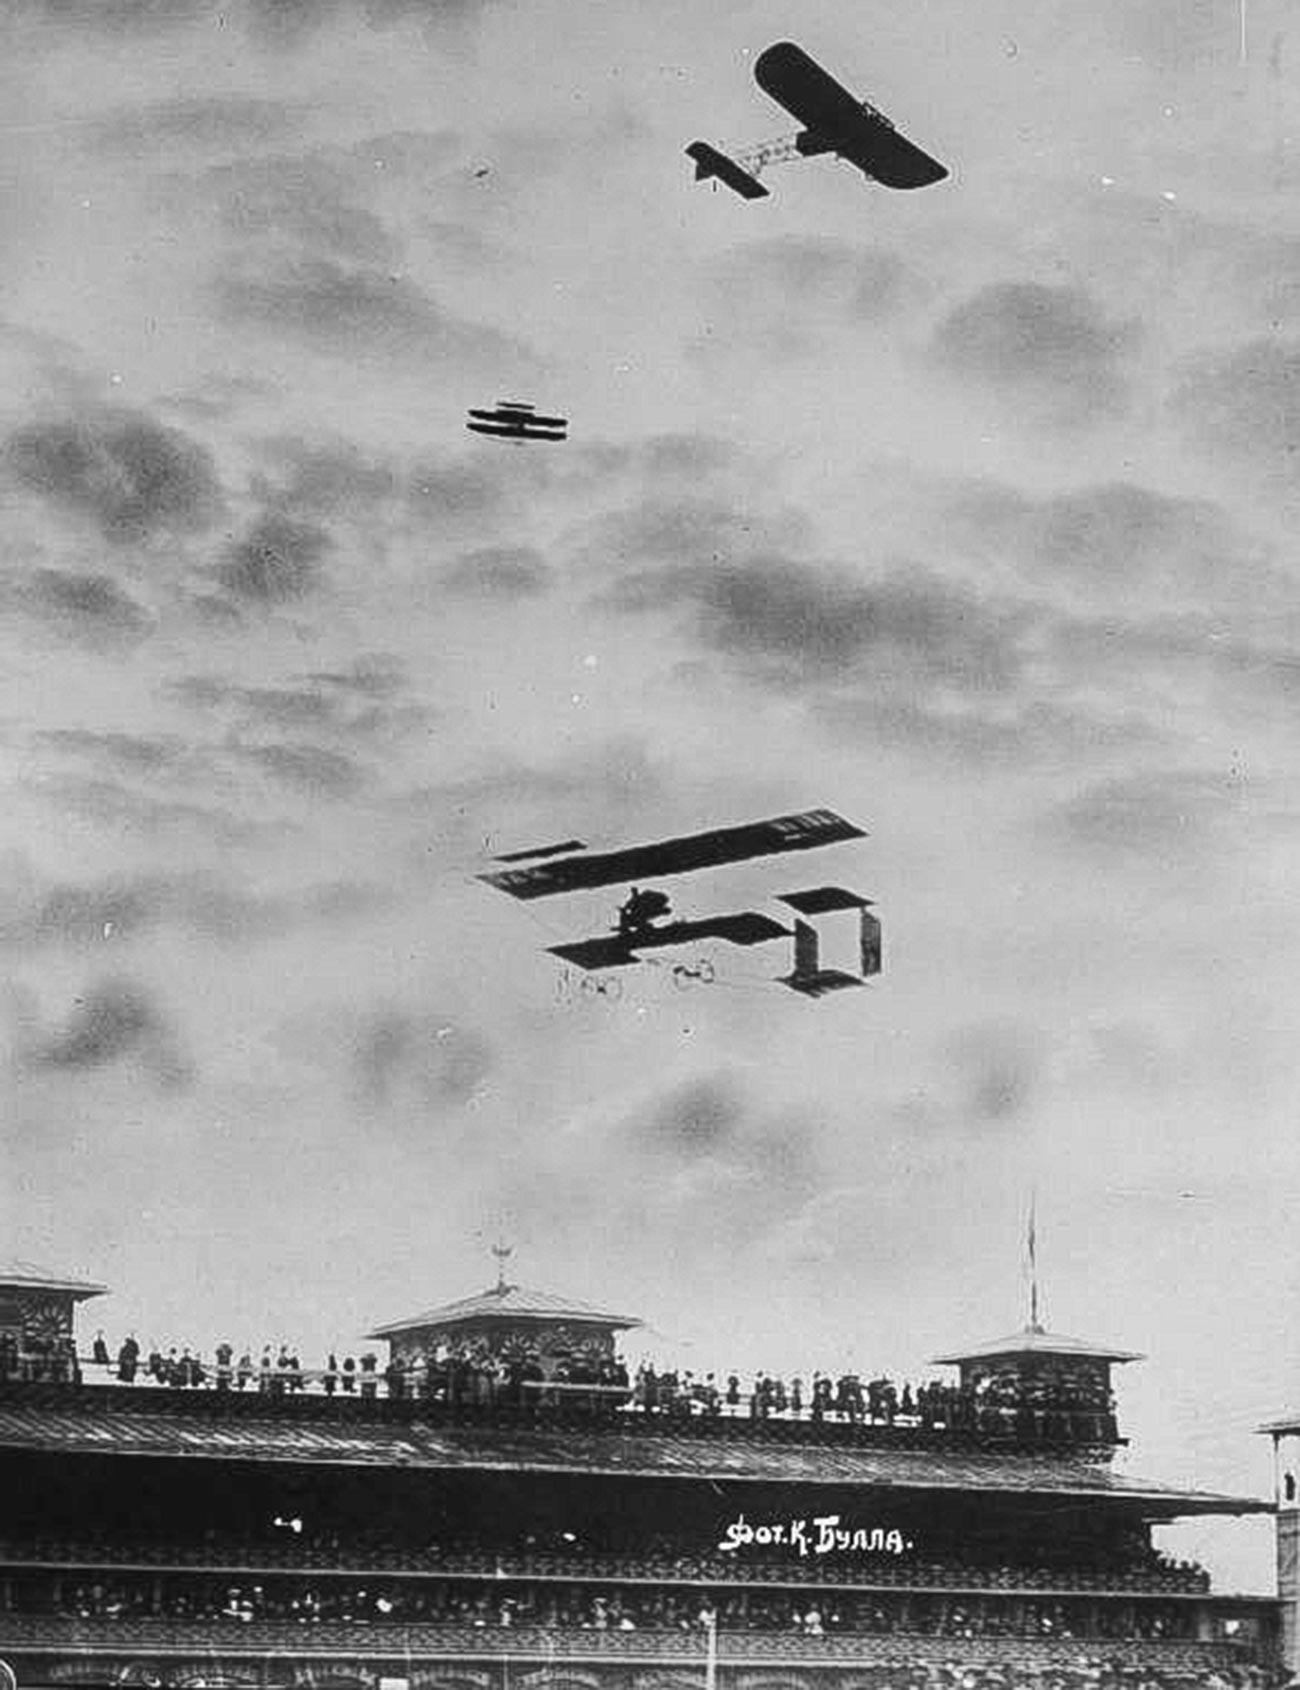 Članovi aerokluba promatraju let aviona